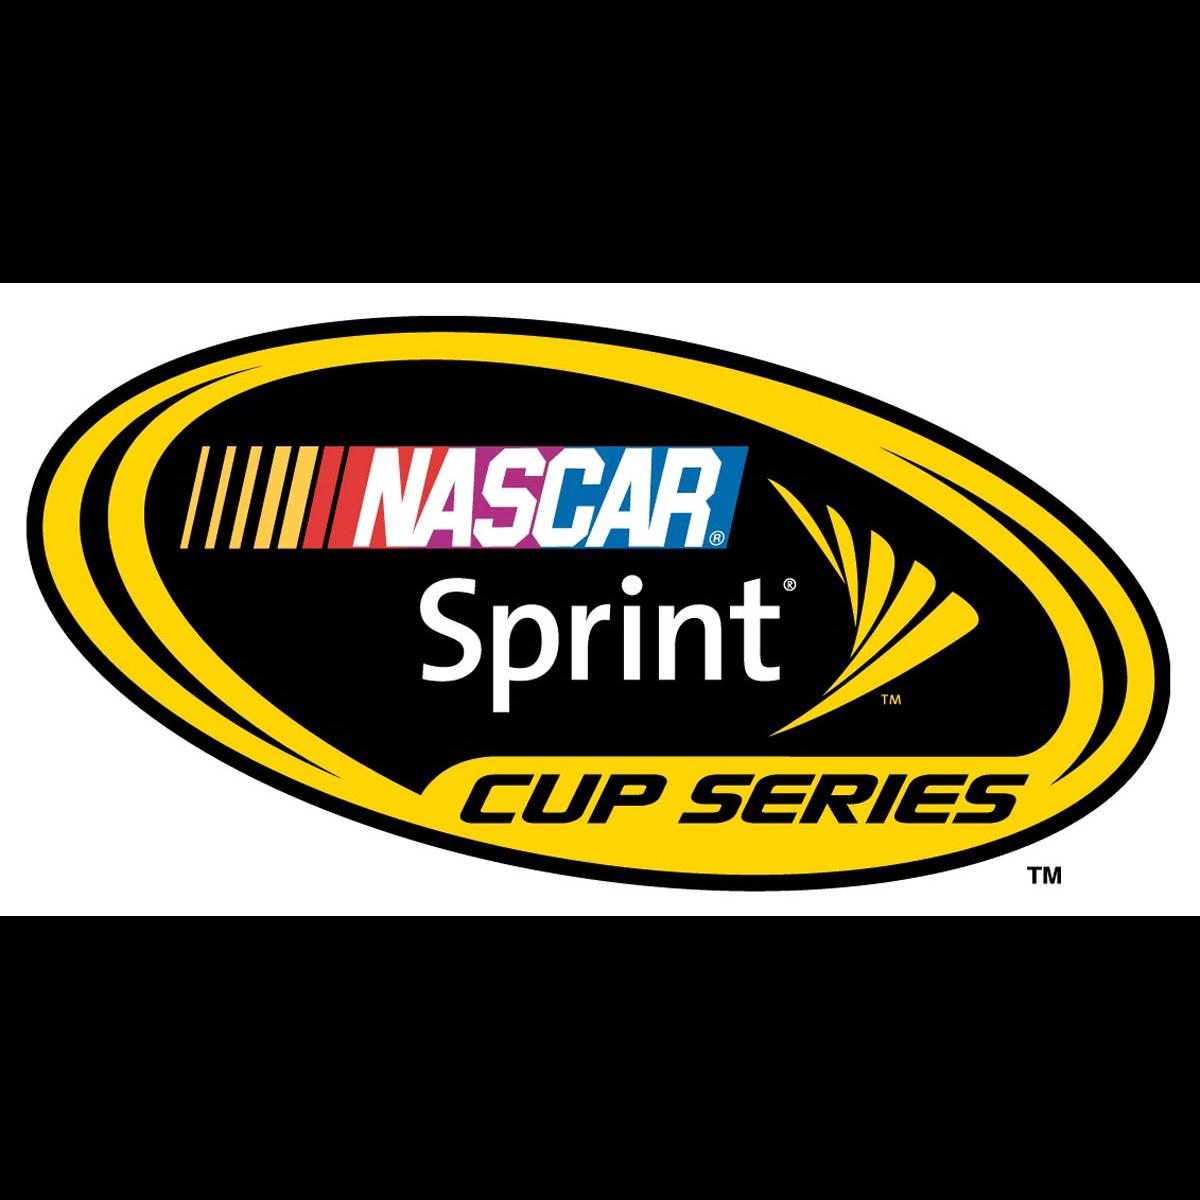 2015 NASCAR